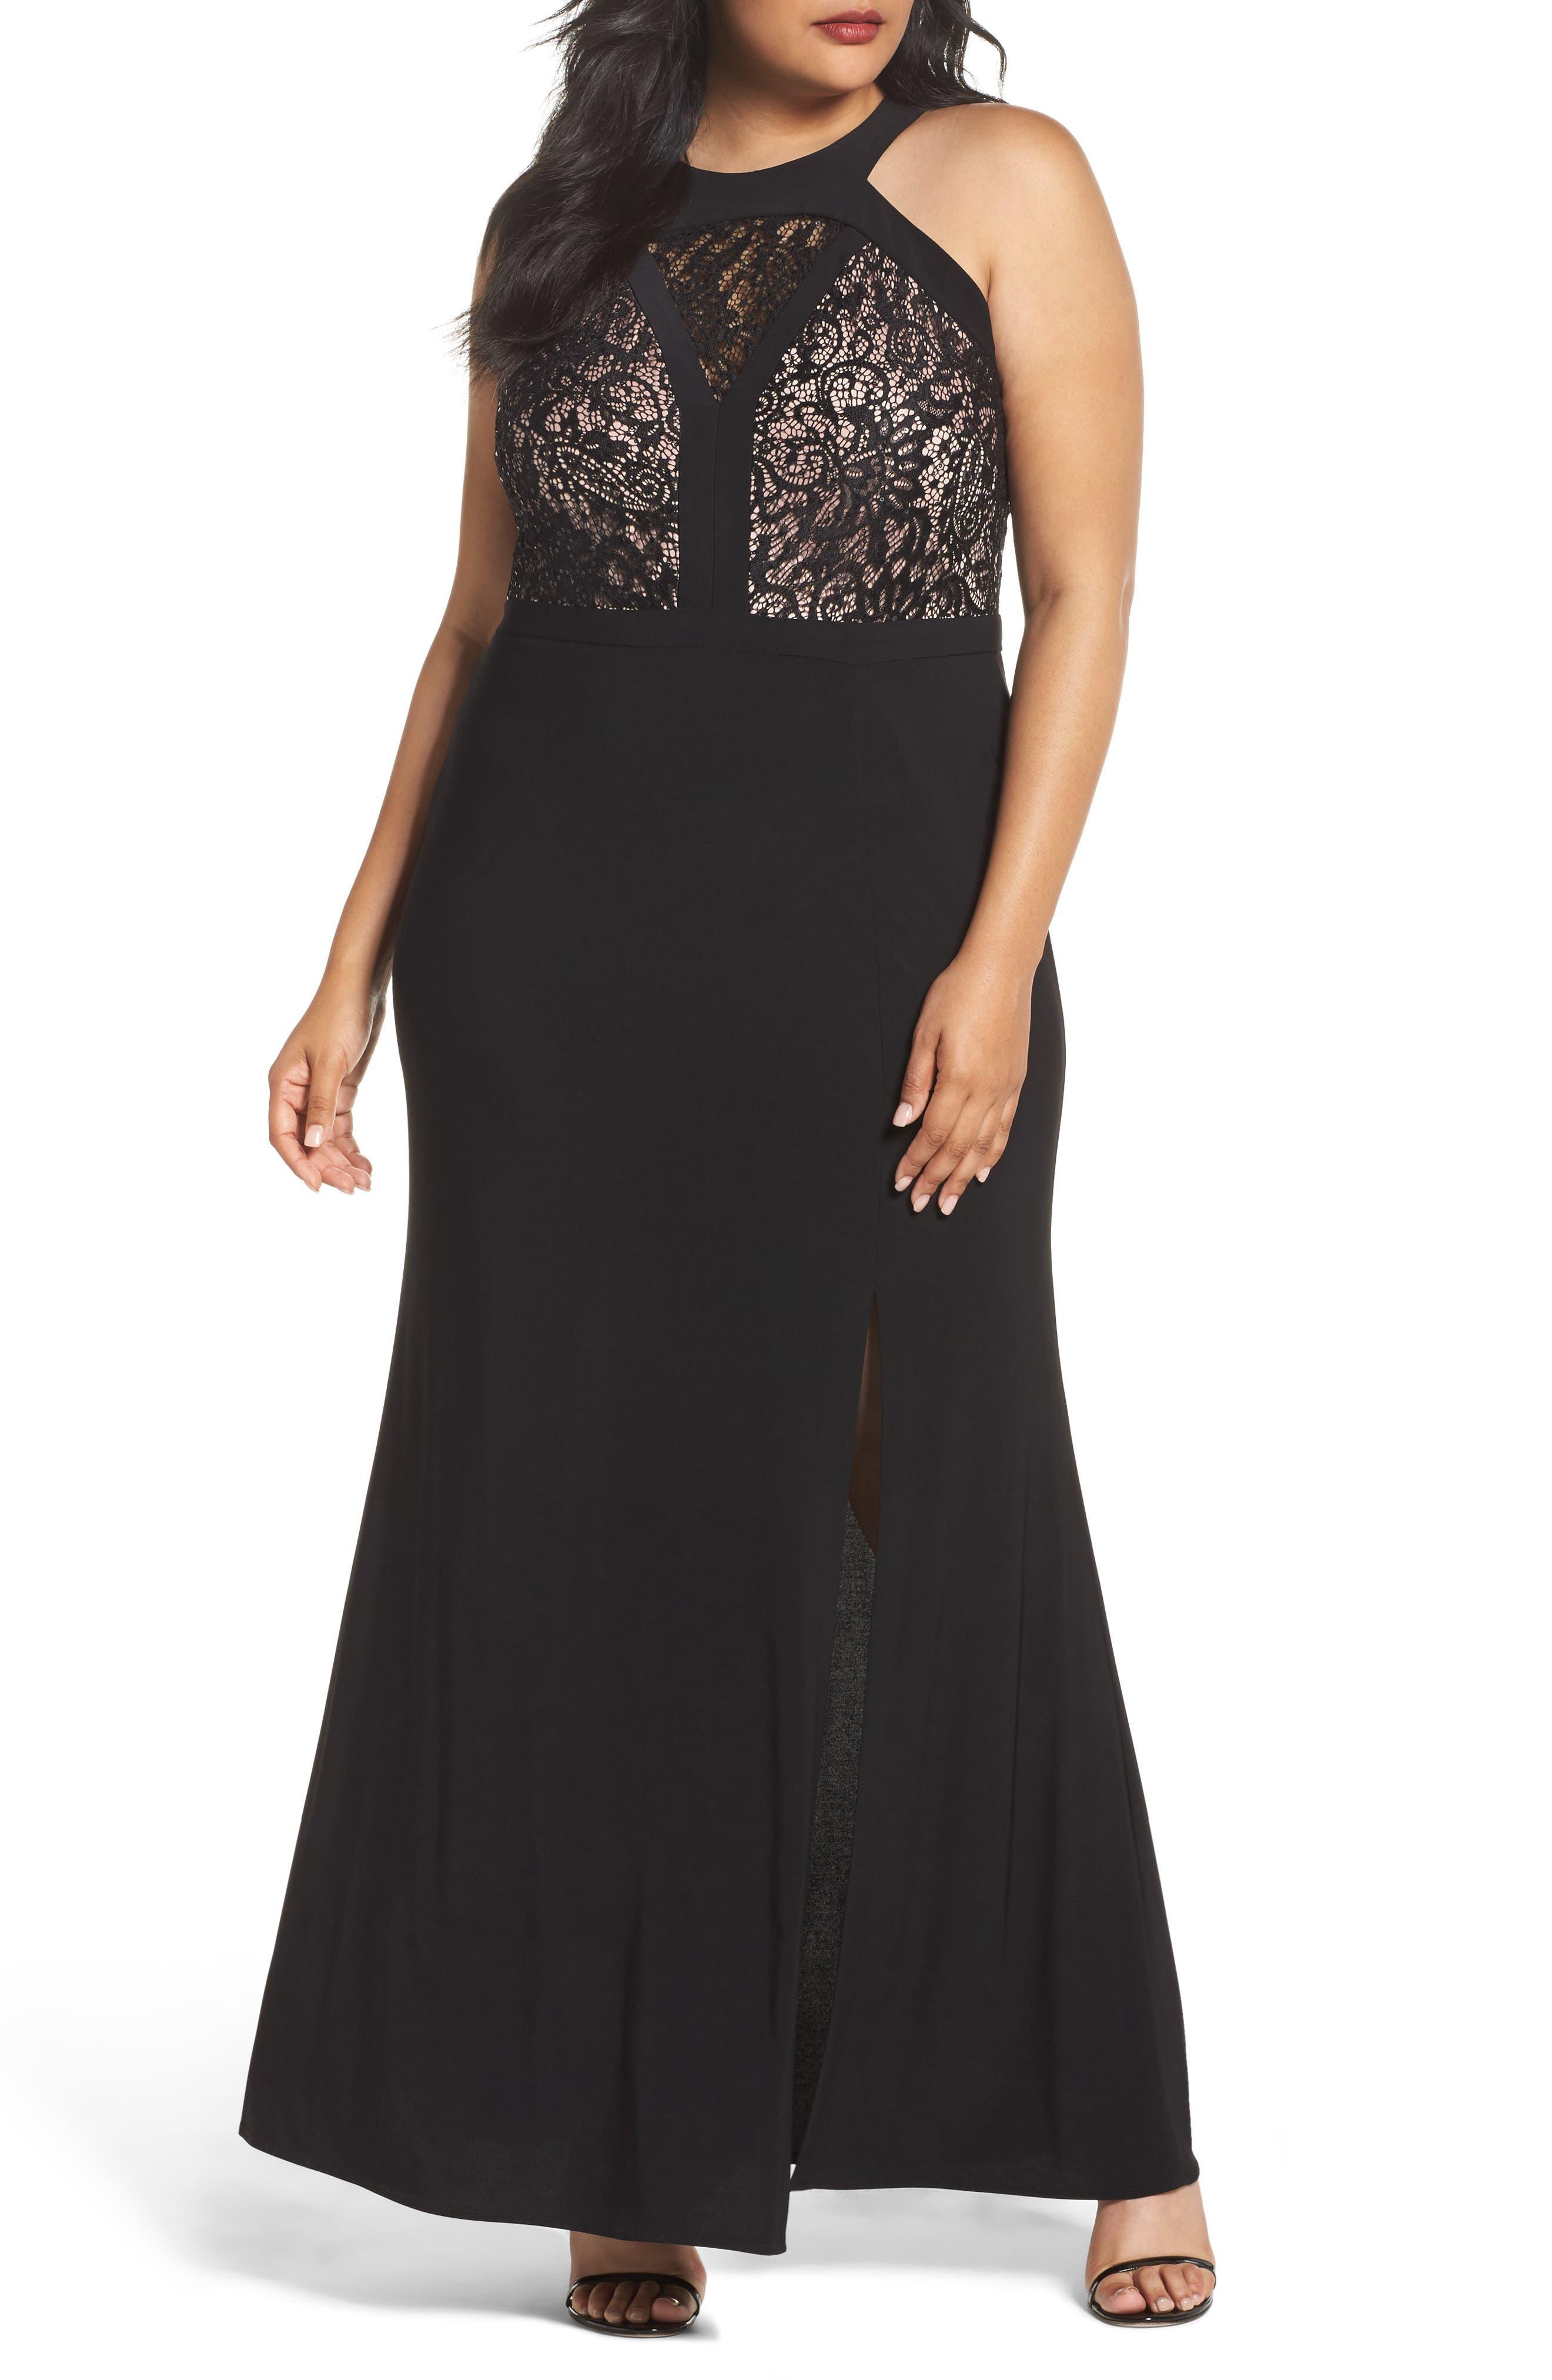 MORGAN & CO. Lace Bodice Dress, Main, color, BLACK/ NUDE